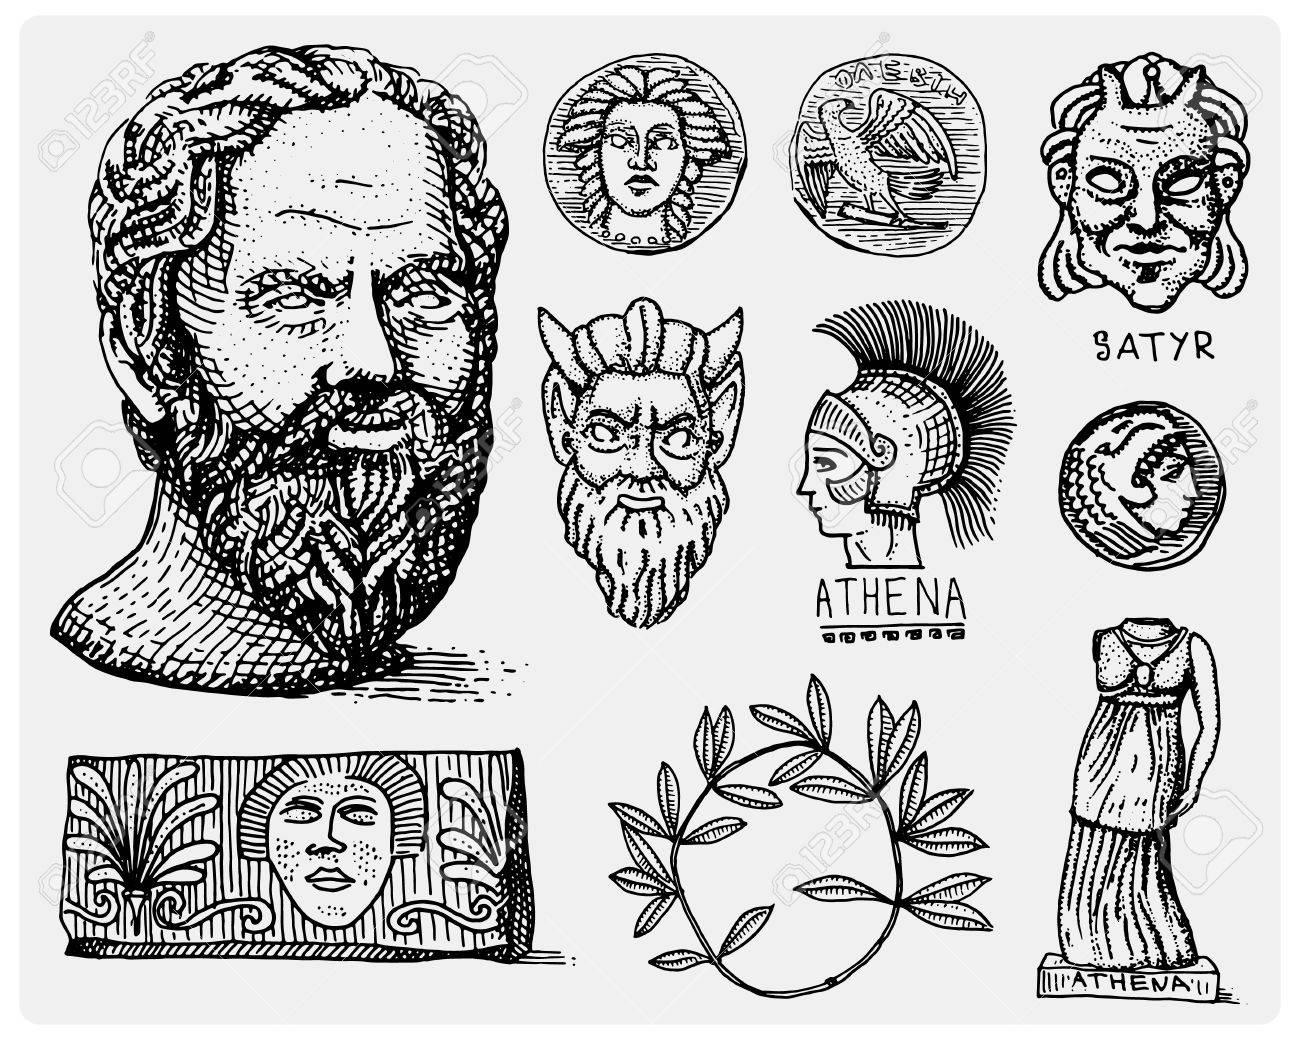 Ancient greece antique symbols socrates head laurel wreath ancient greece antique symbols socrates head laurel wreath athena statue and satyr face biocorpaavc Images